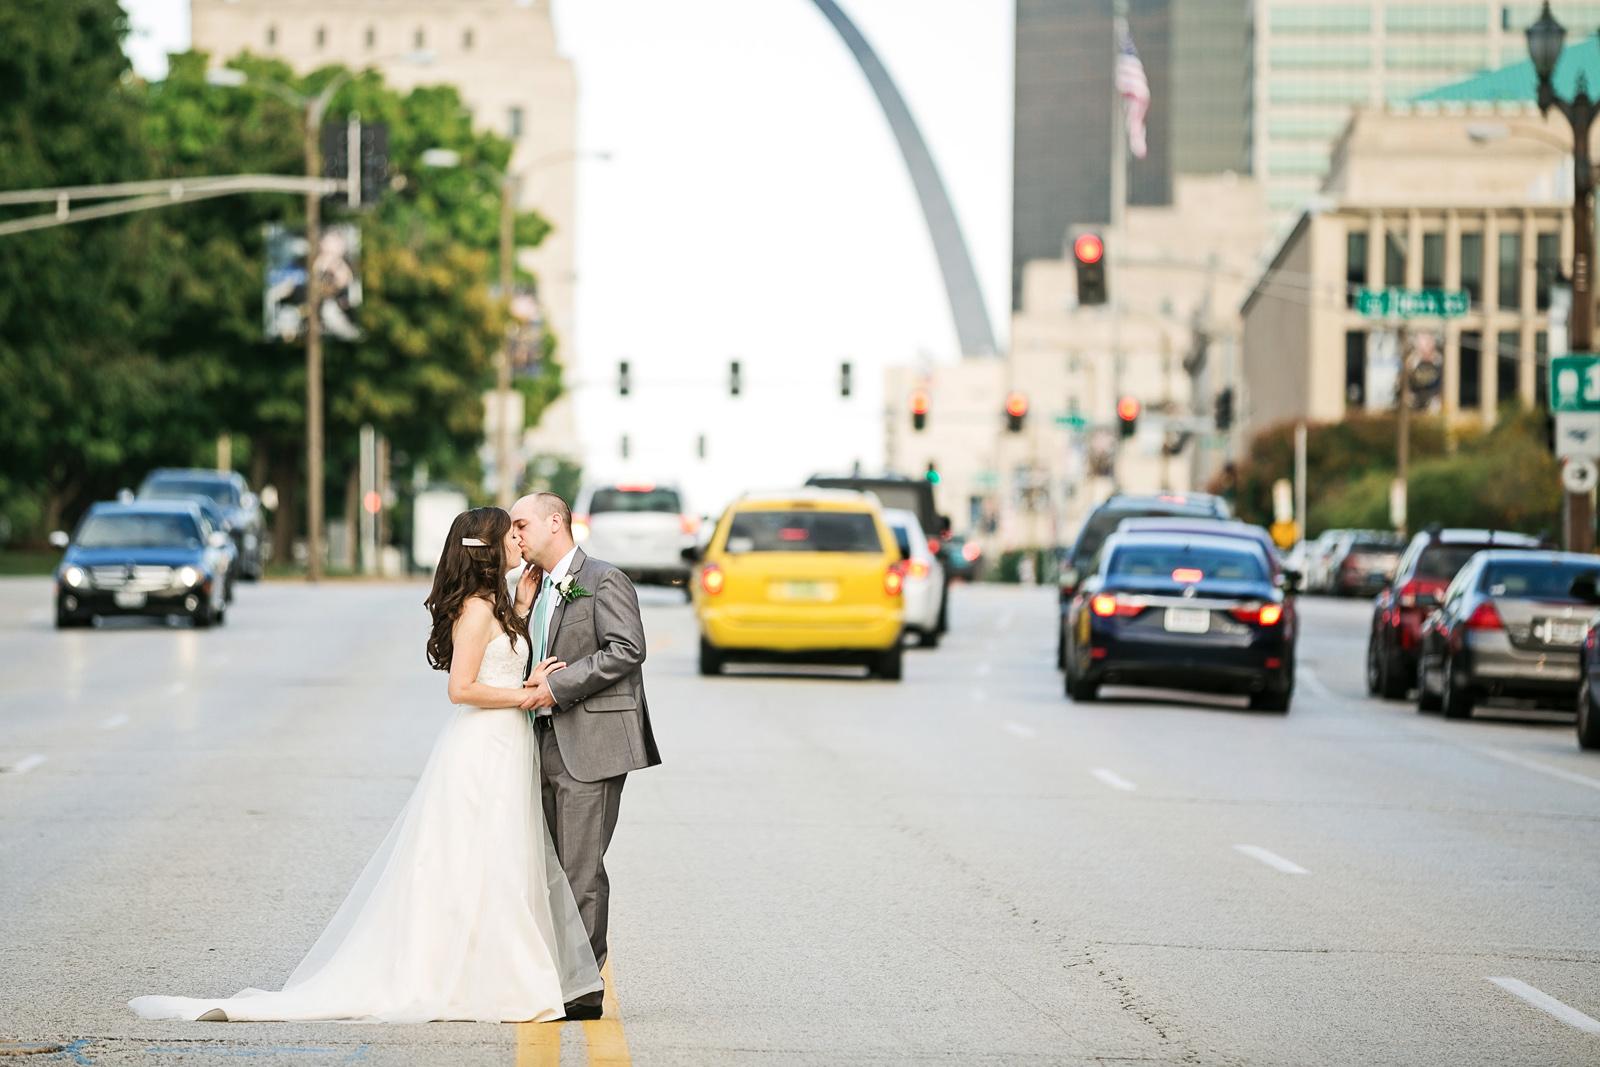 Oldani-Photography-St-Louis-Union-Station-Wedding-Party-wedding-photos_20140927_17183398.jpg